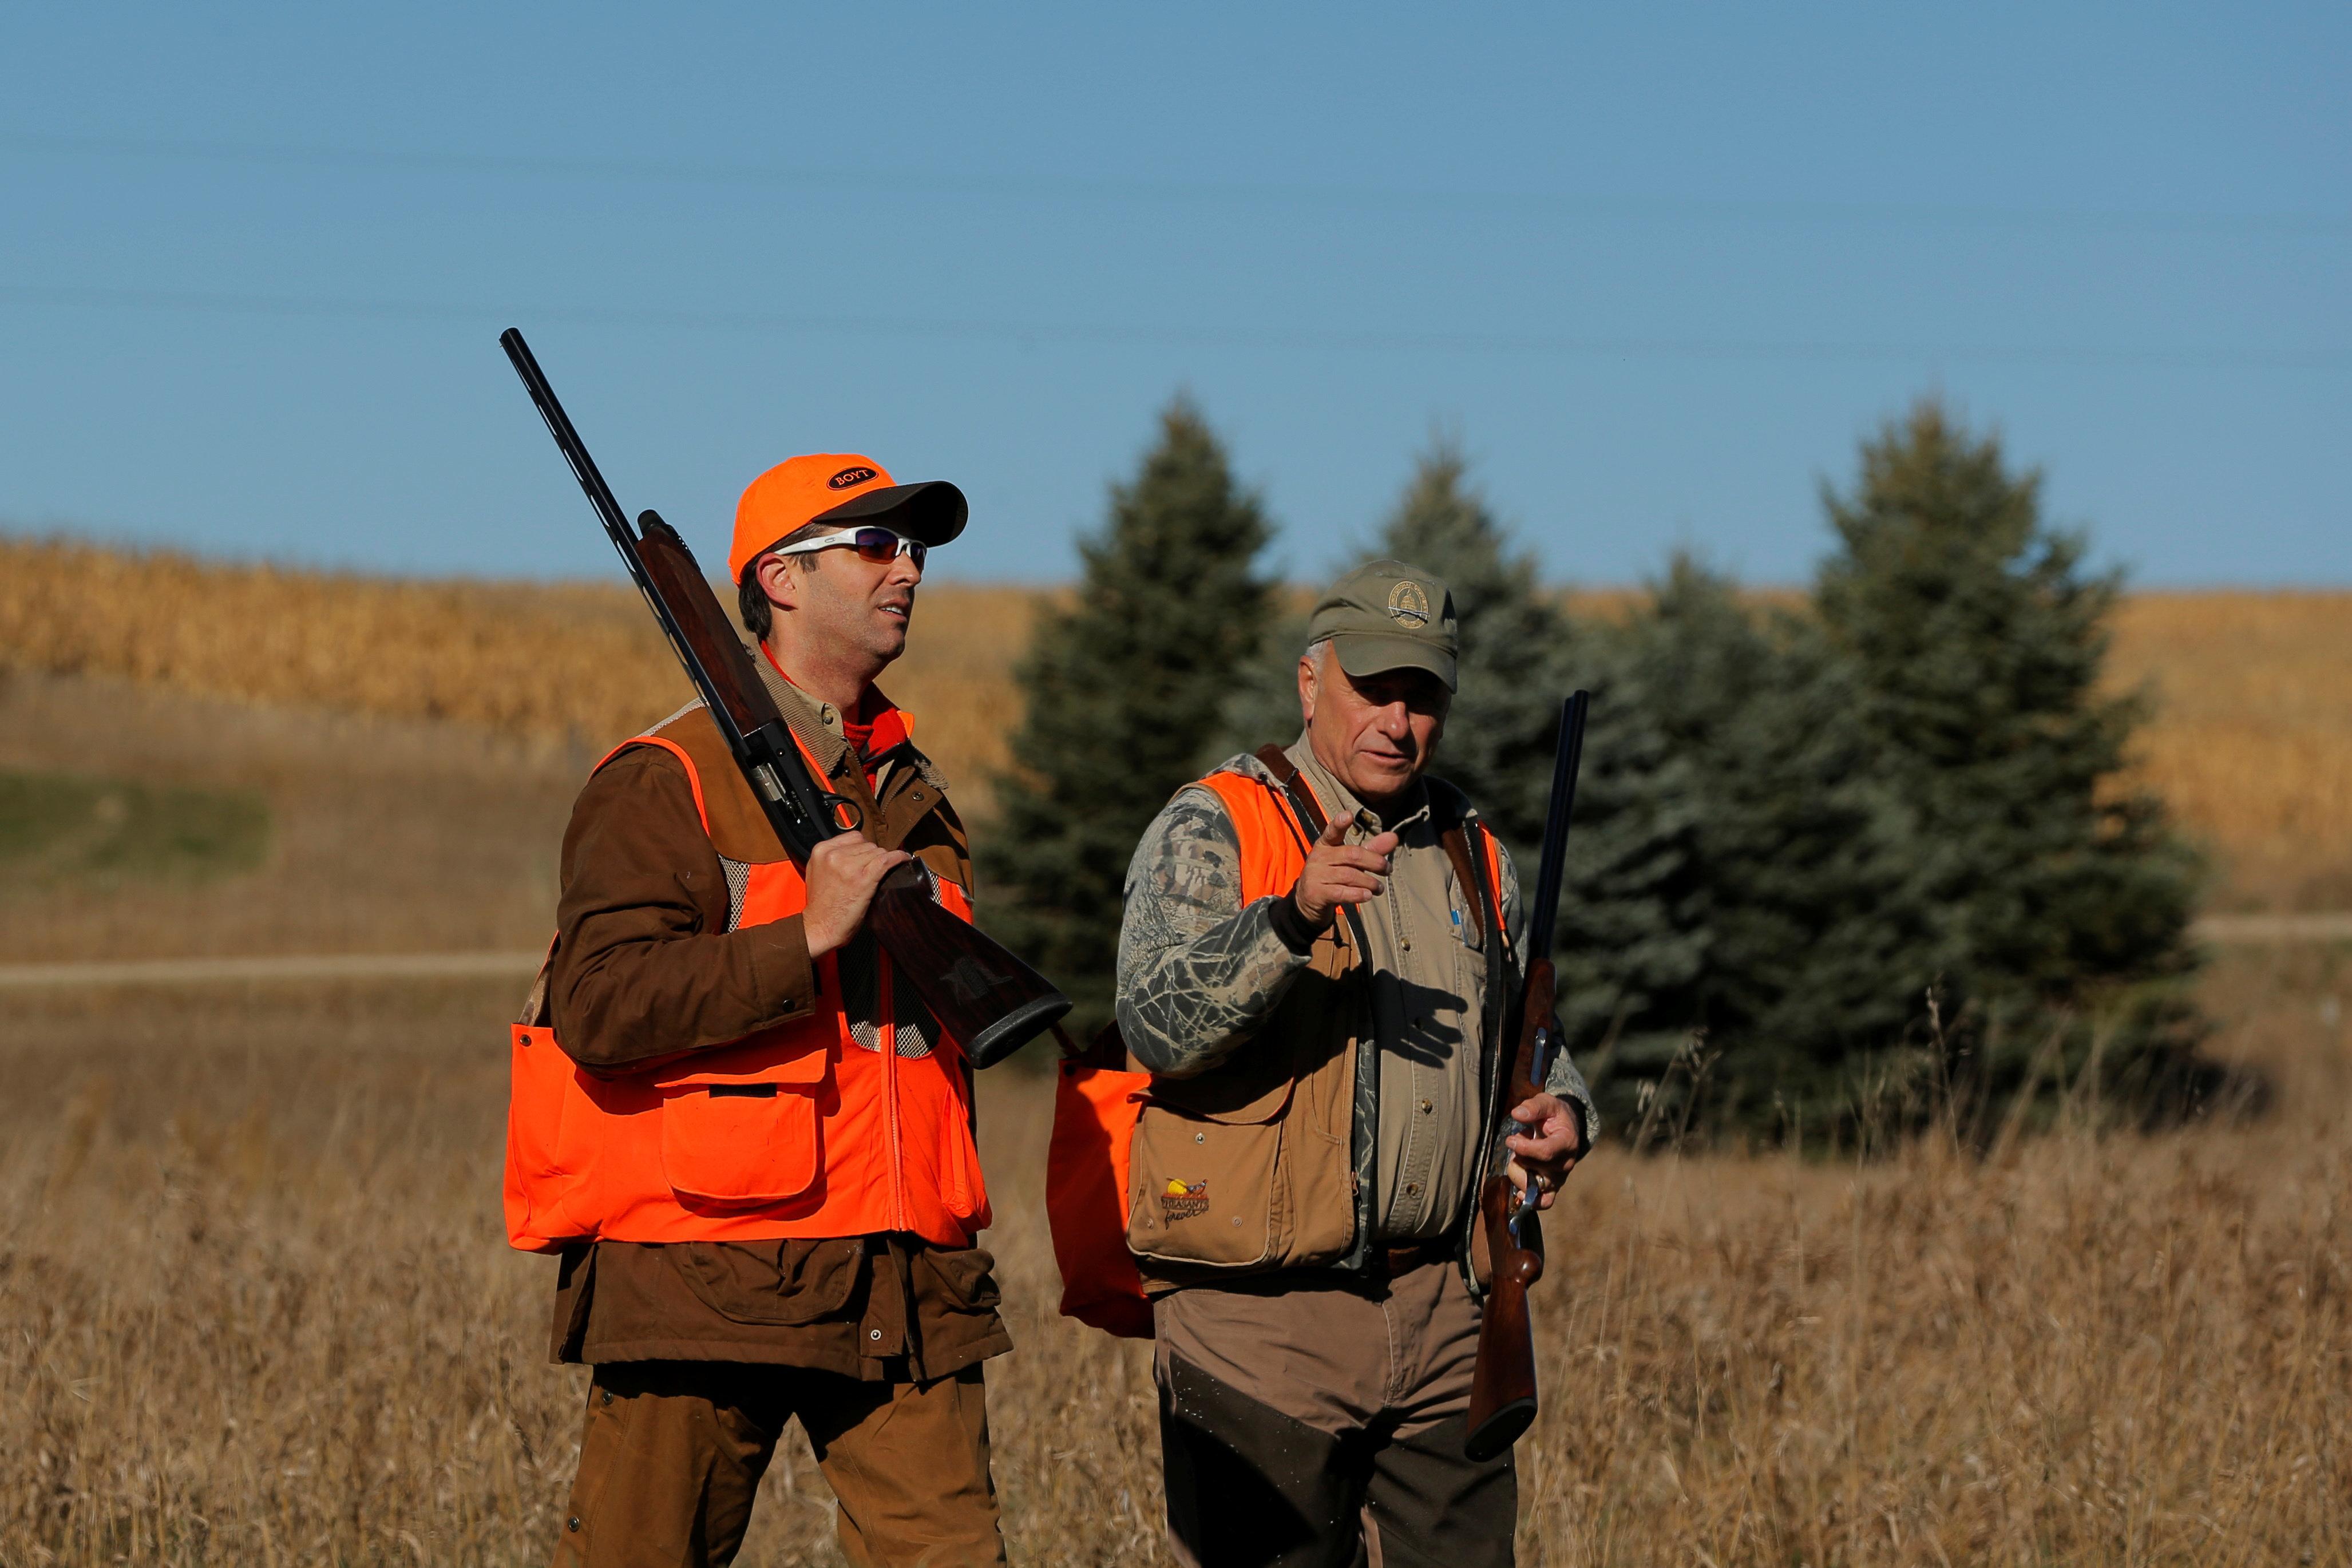 Donald Trump Jr and Rep Steve King R-Iowa on a peasant/pheasant hunt in Iowa